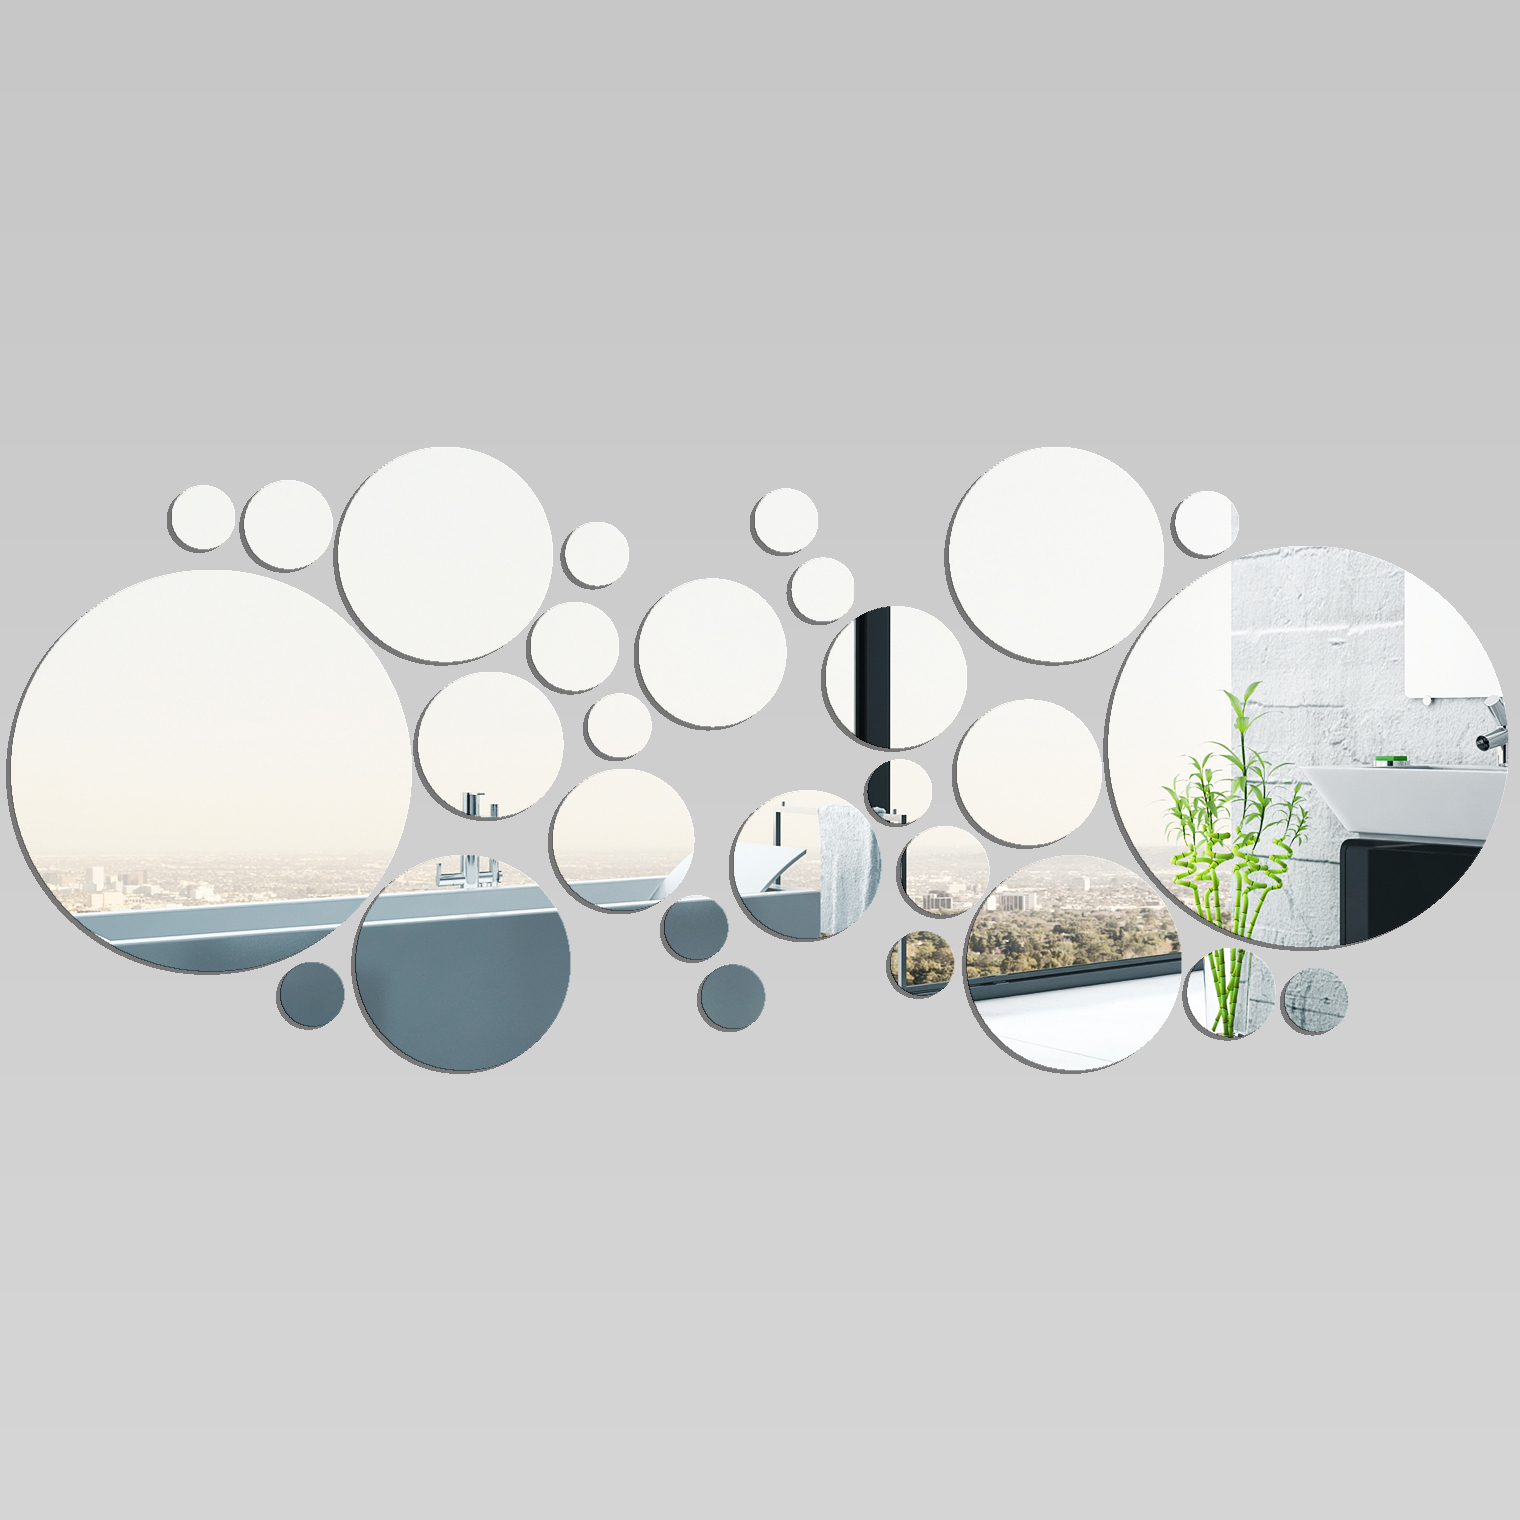 wandtattoos folies wandspiegel aus acrylglas kreise. Black Bedroom Furniture Sets. Home Design Ideas